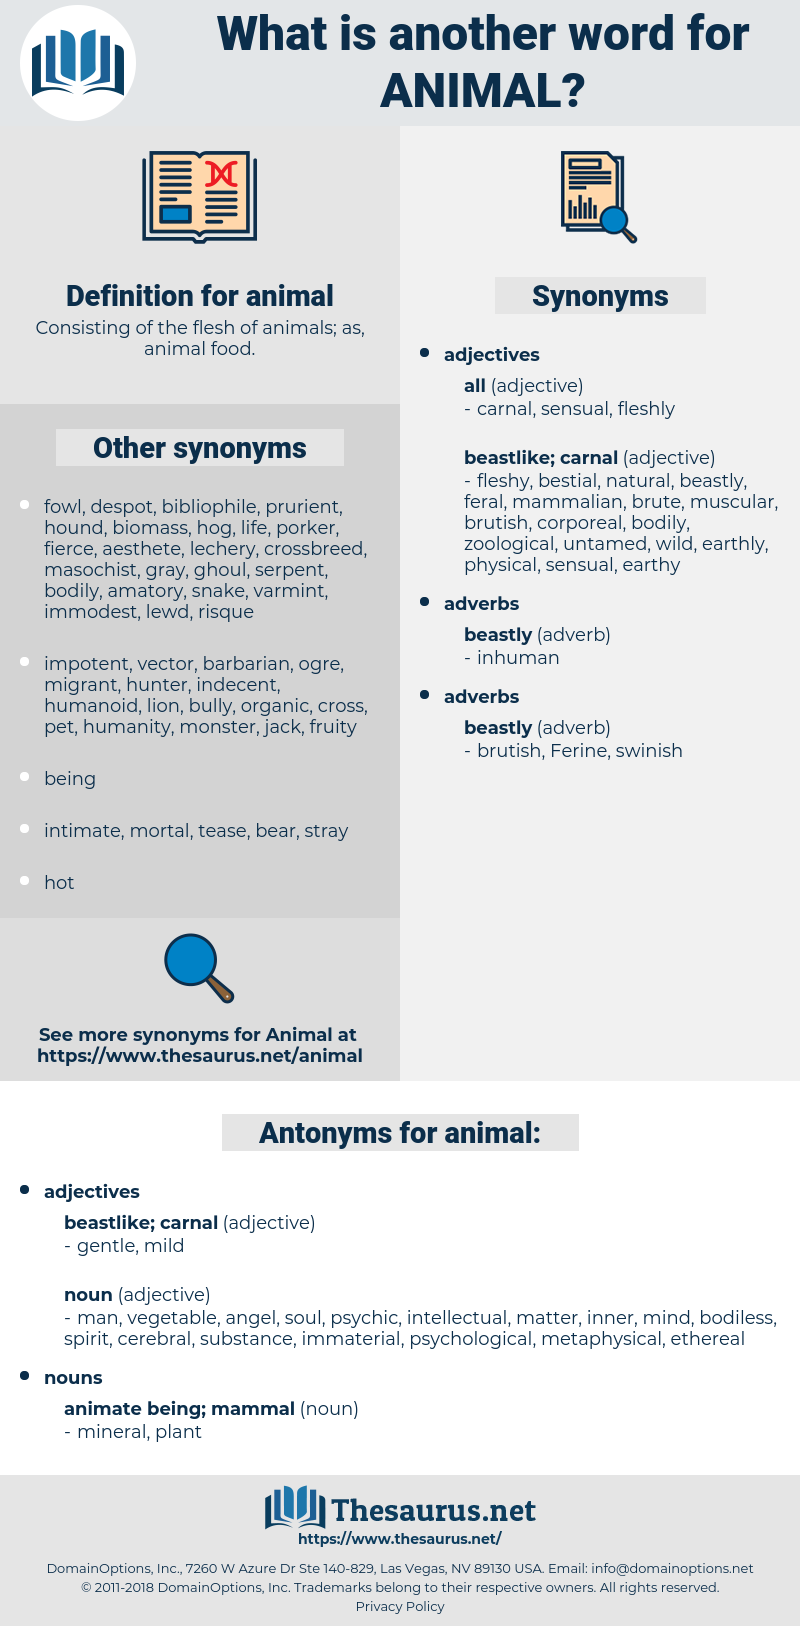 animal, synonym animal, another word for animal, words like animal, thesaurus animal